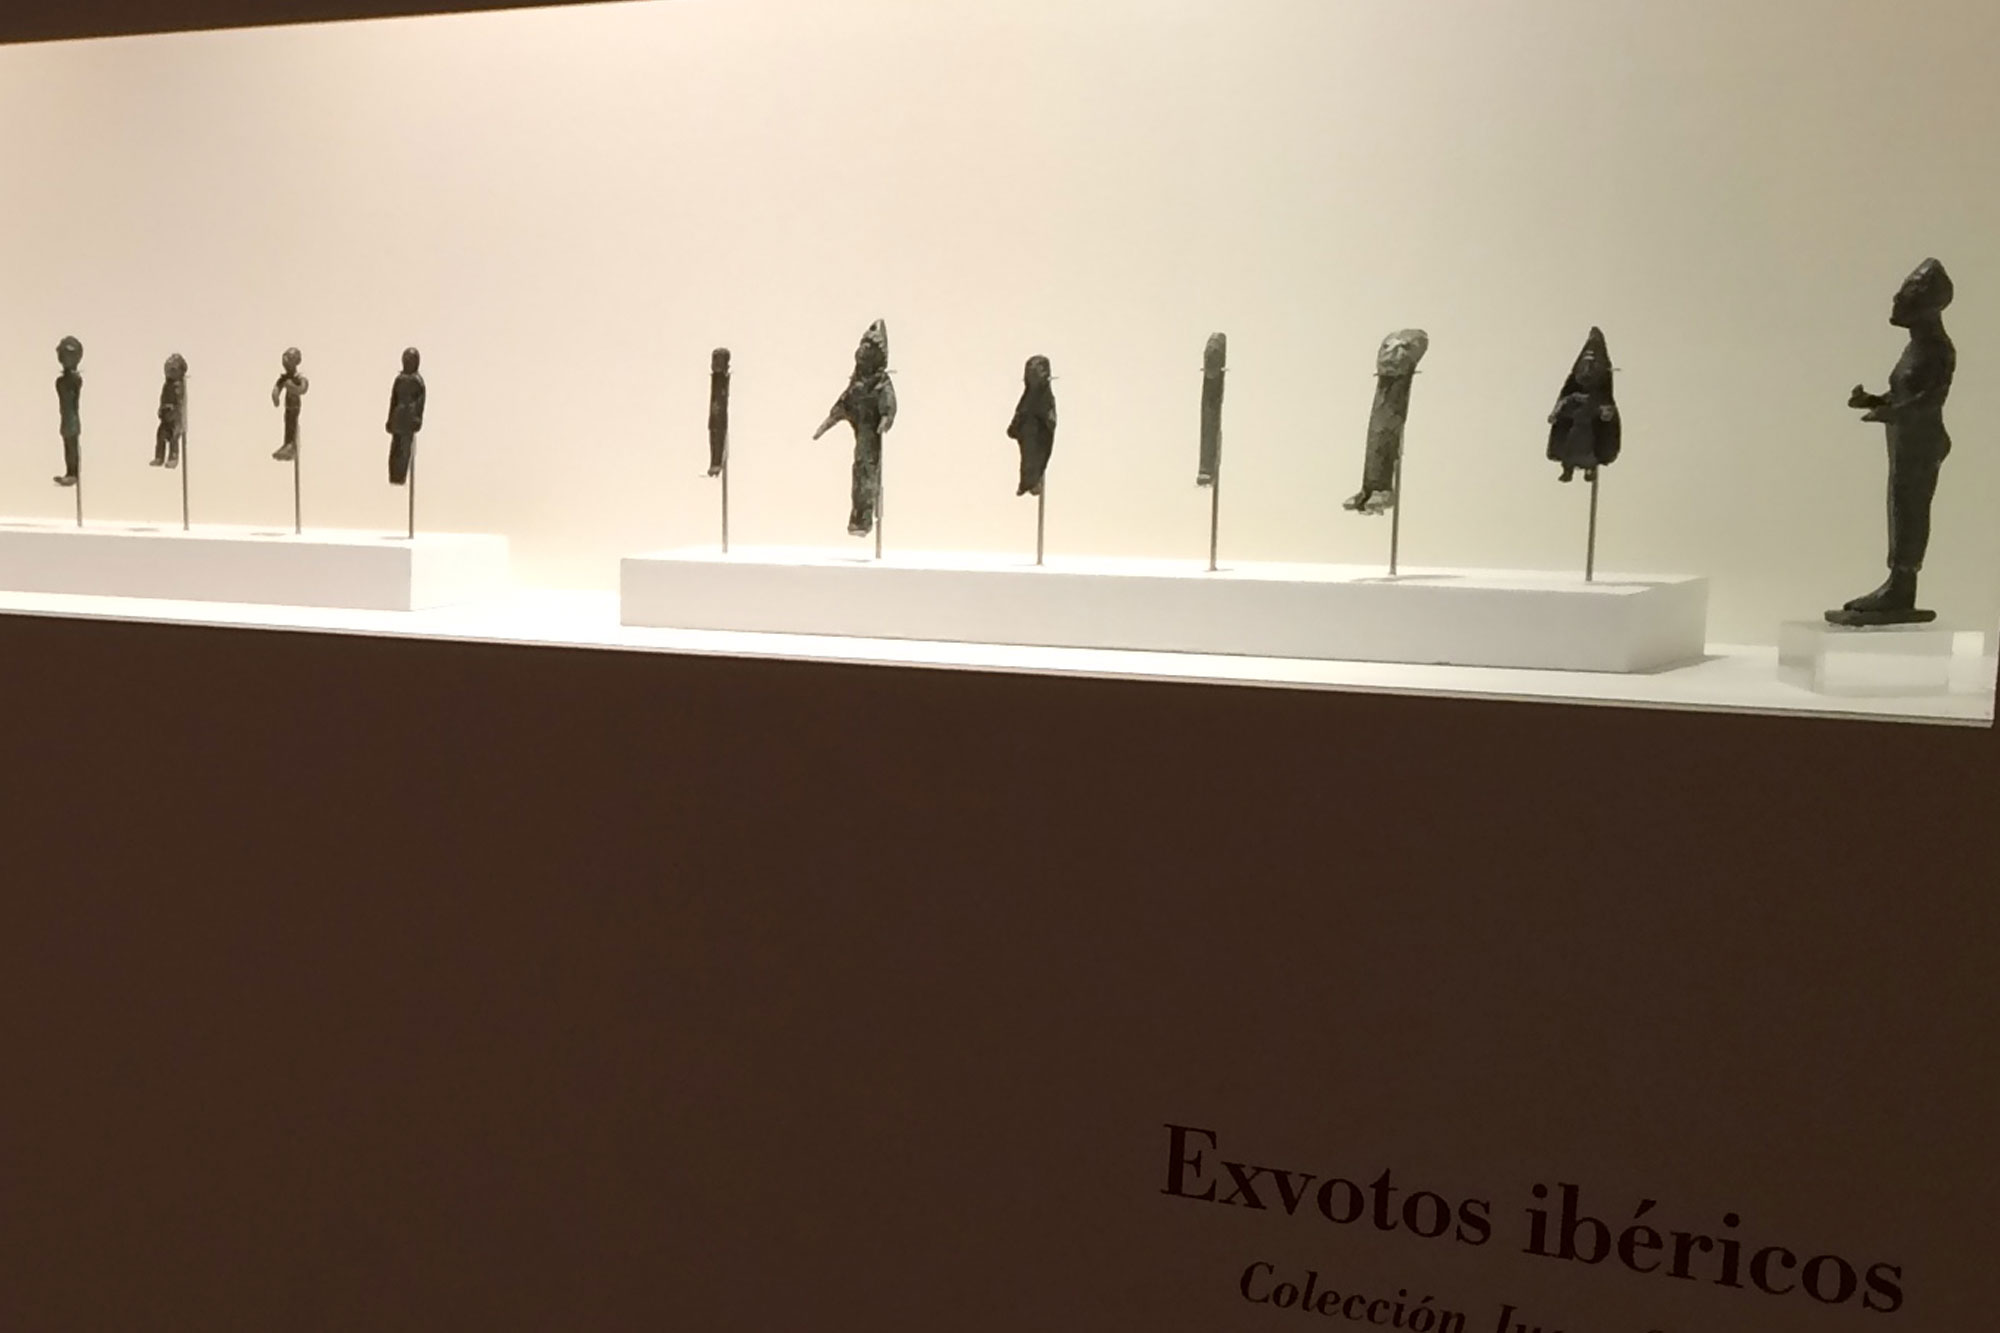 Museo Joan Cabré - Calaceite